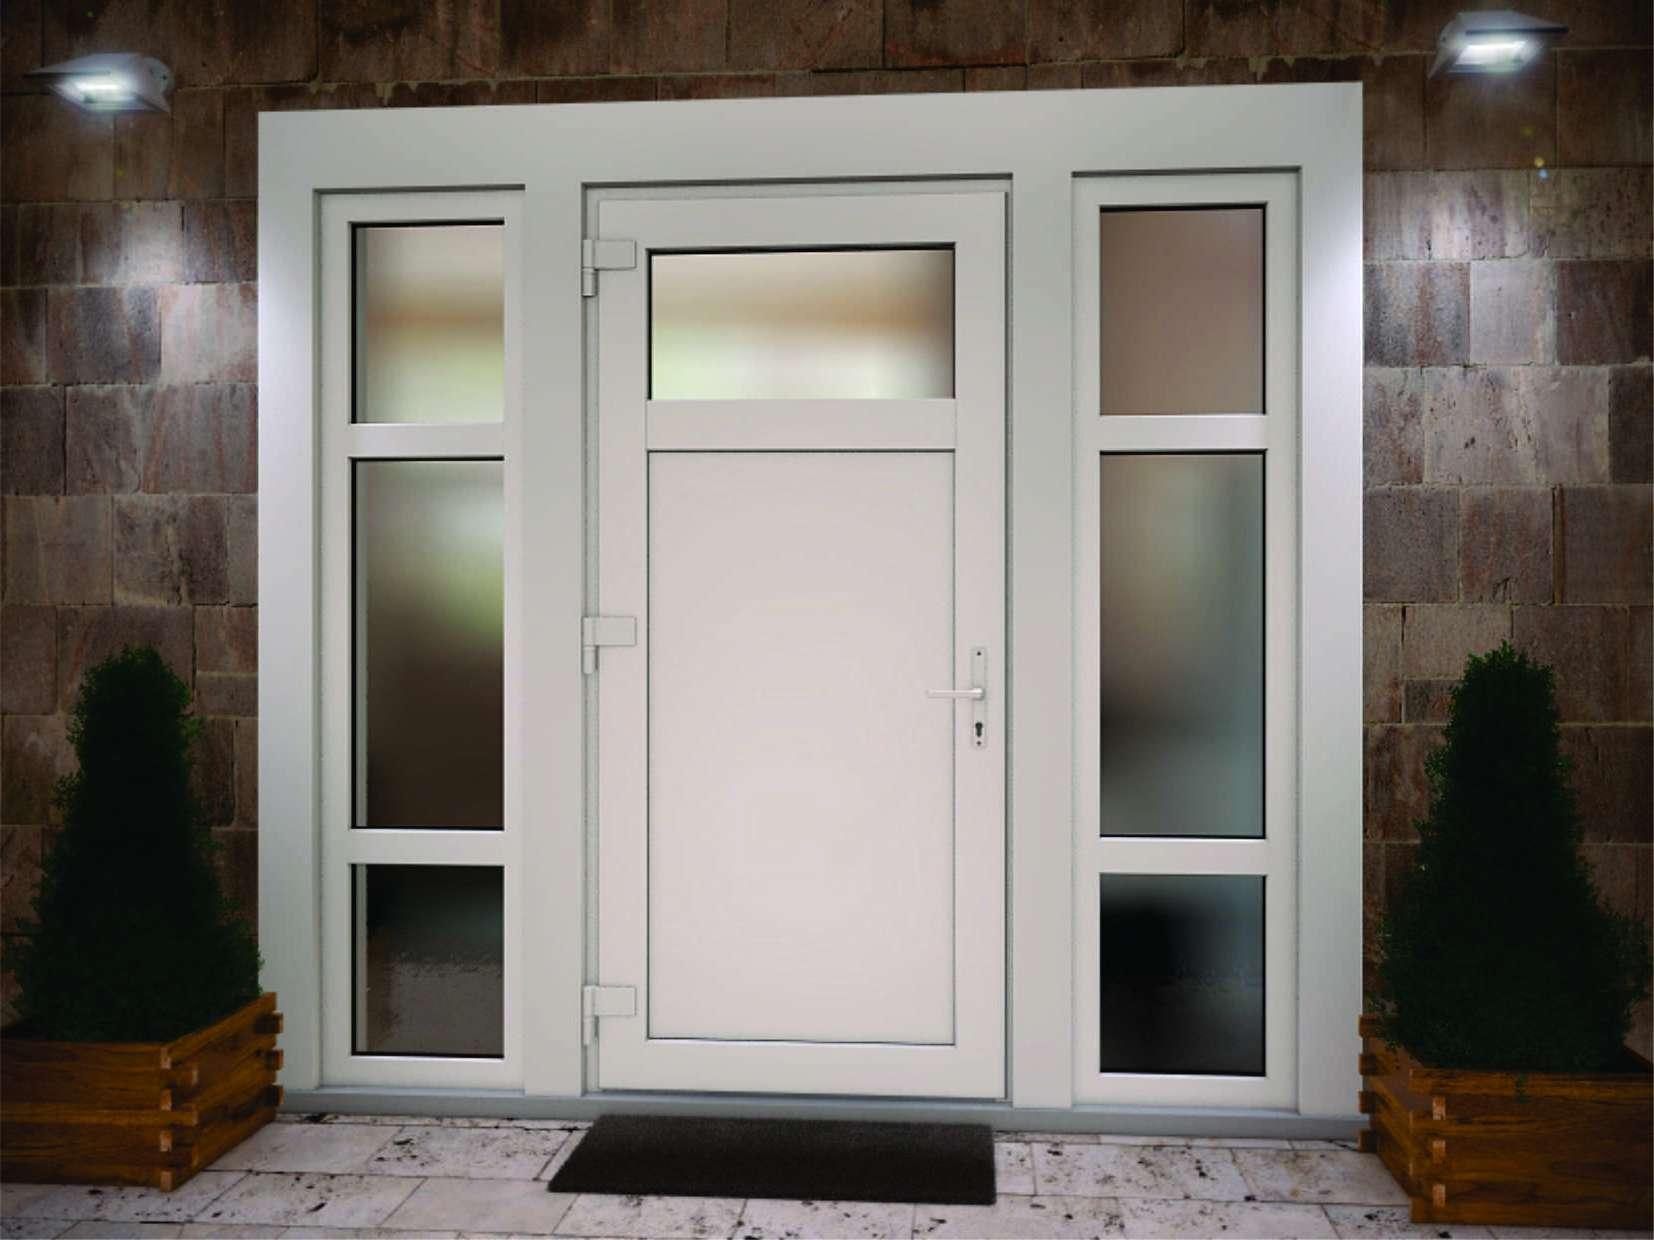 vhod4